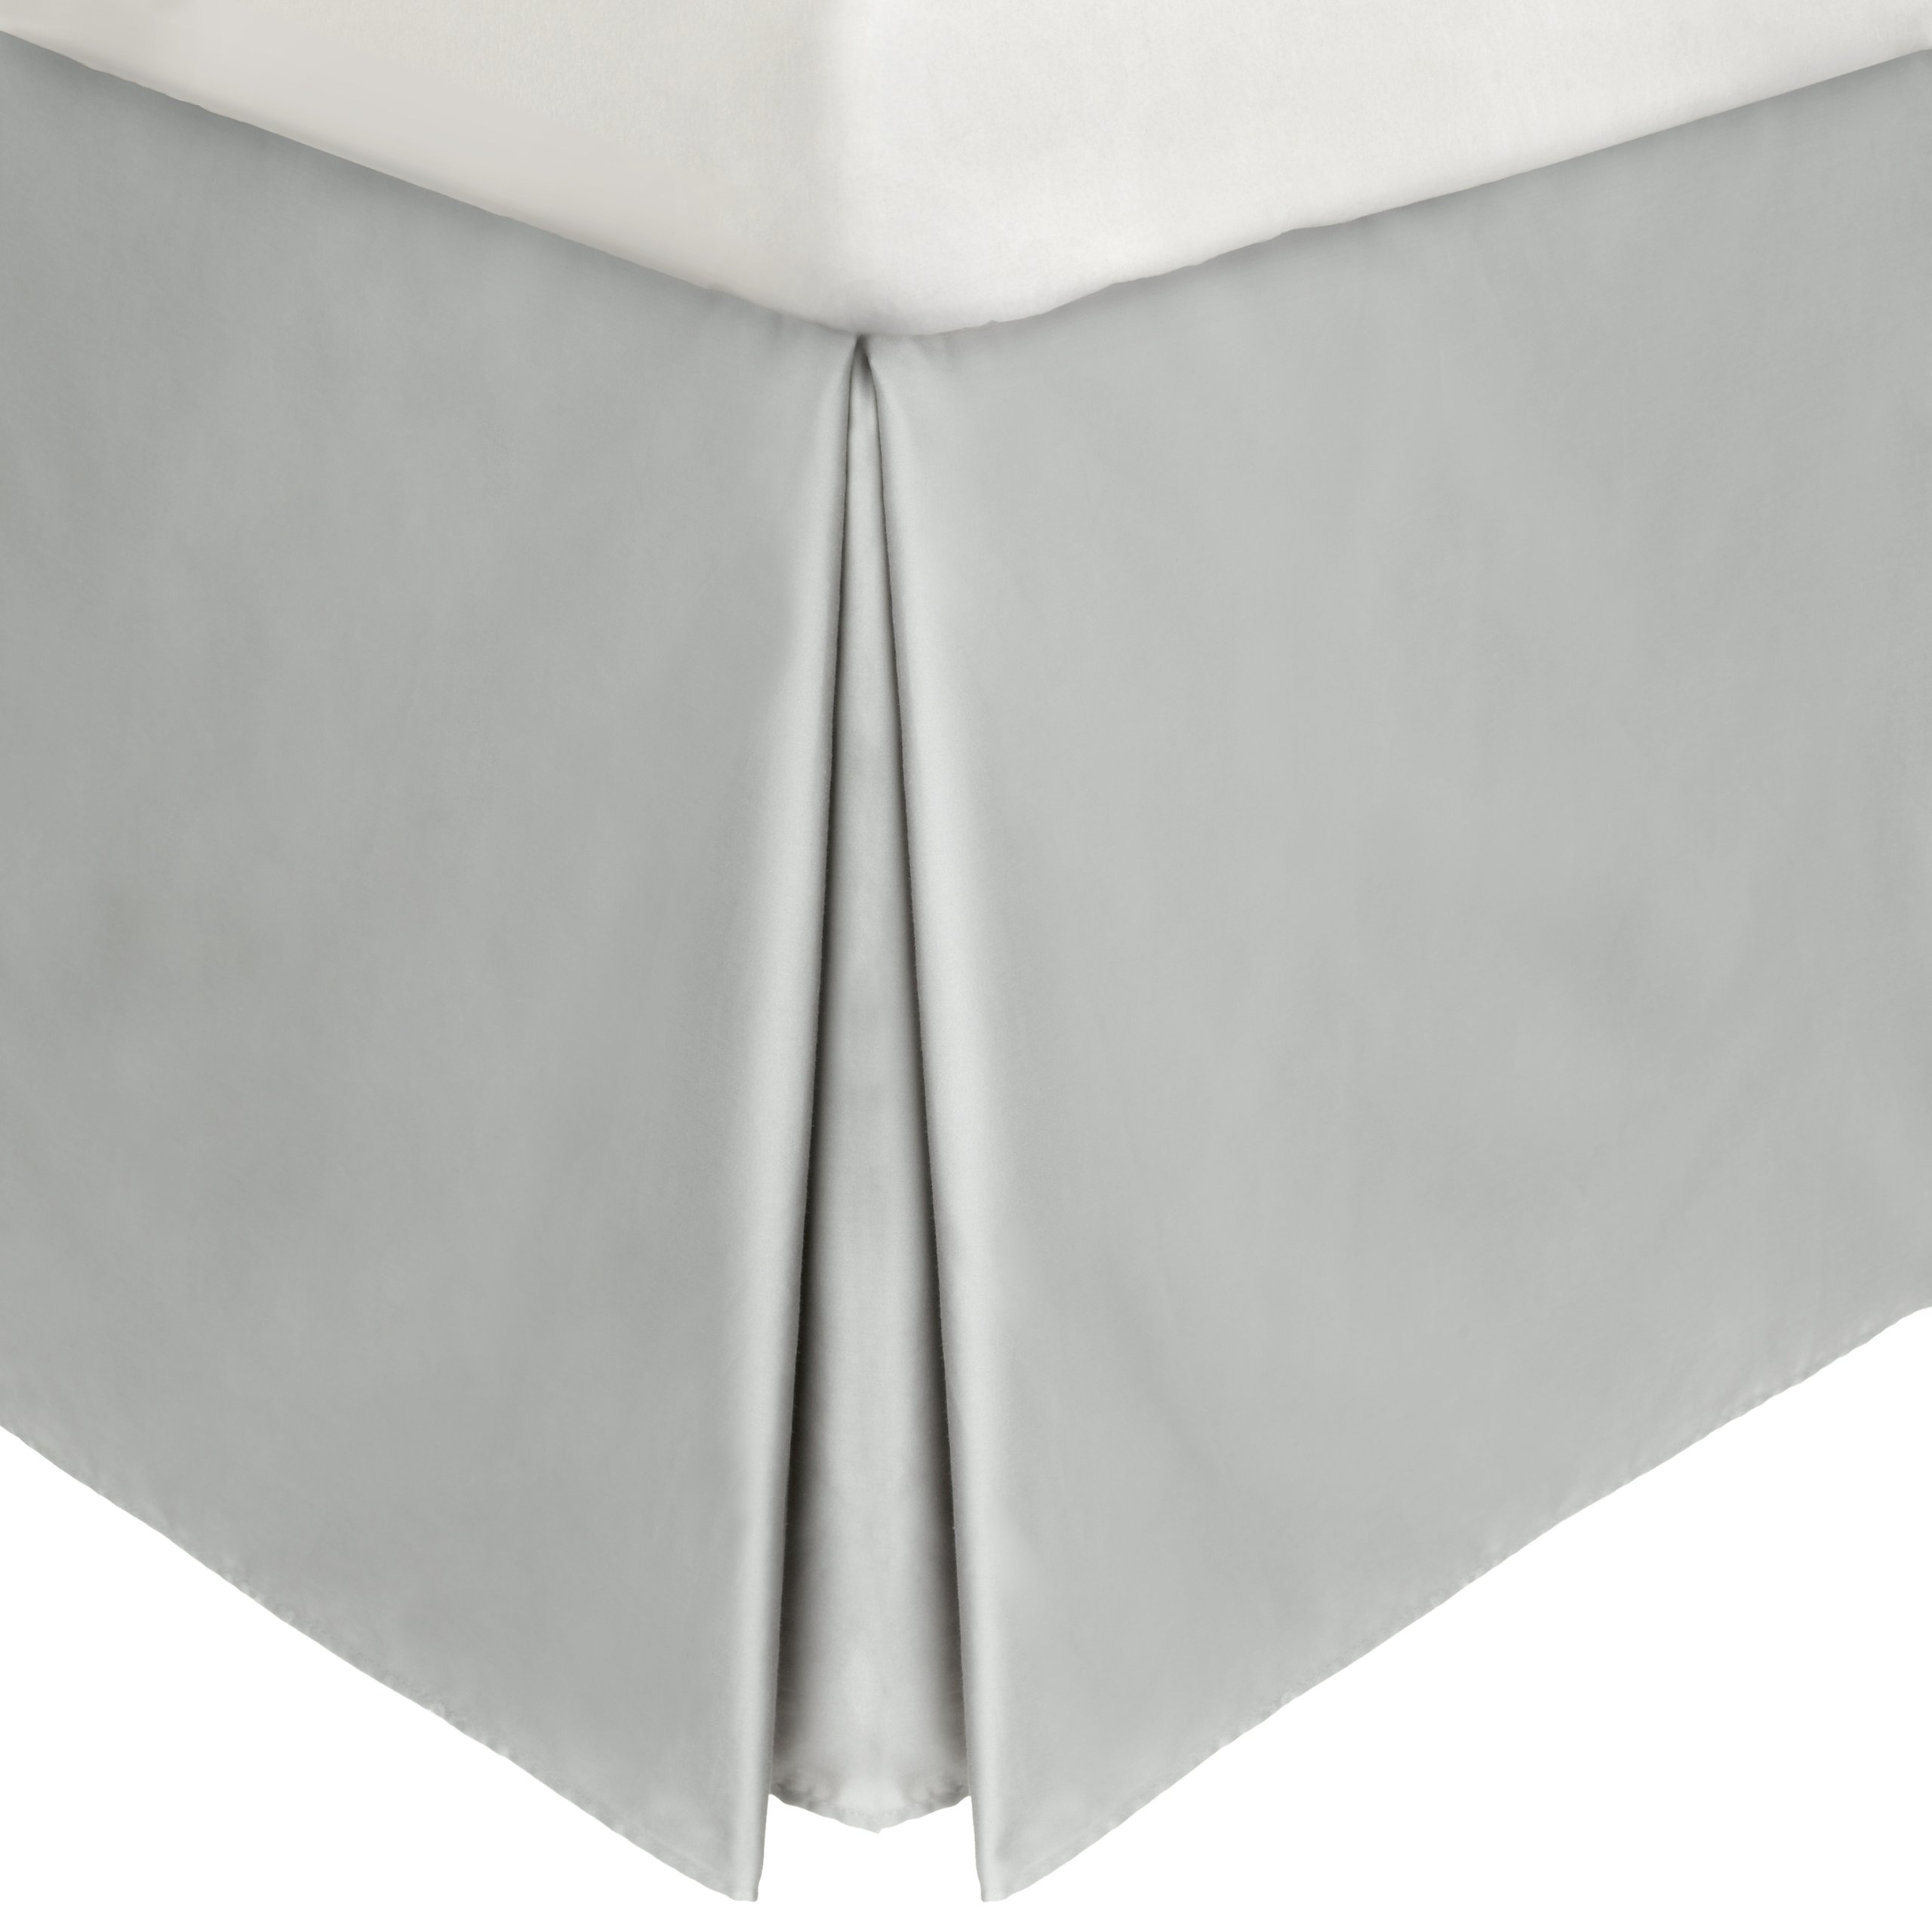 Calvin Klein Home Briar Double Row Cord California King Bedskirt, Pale Gray